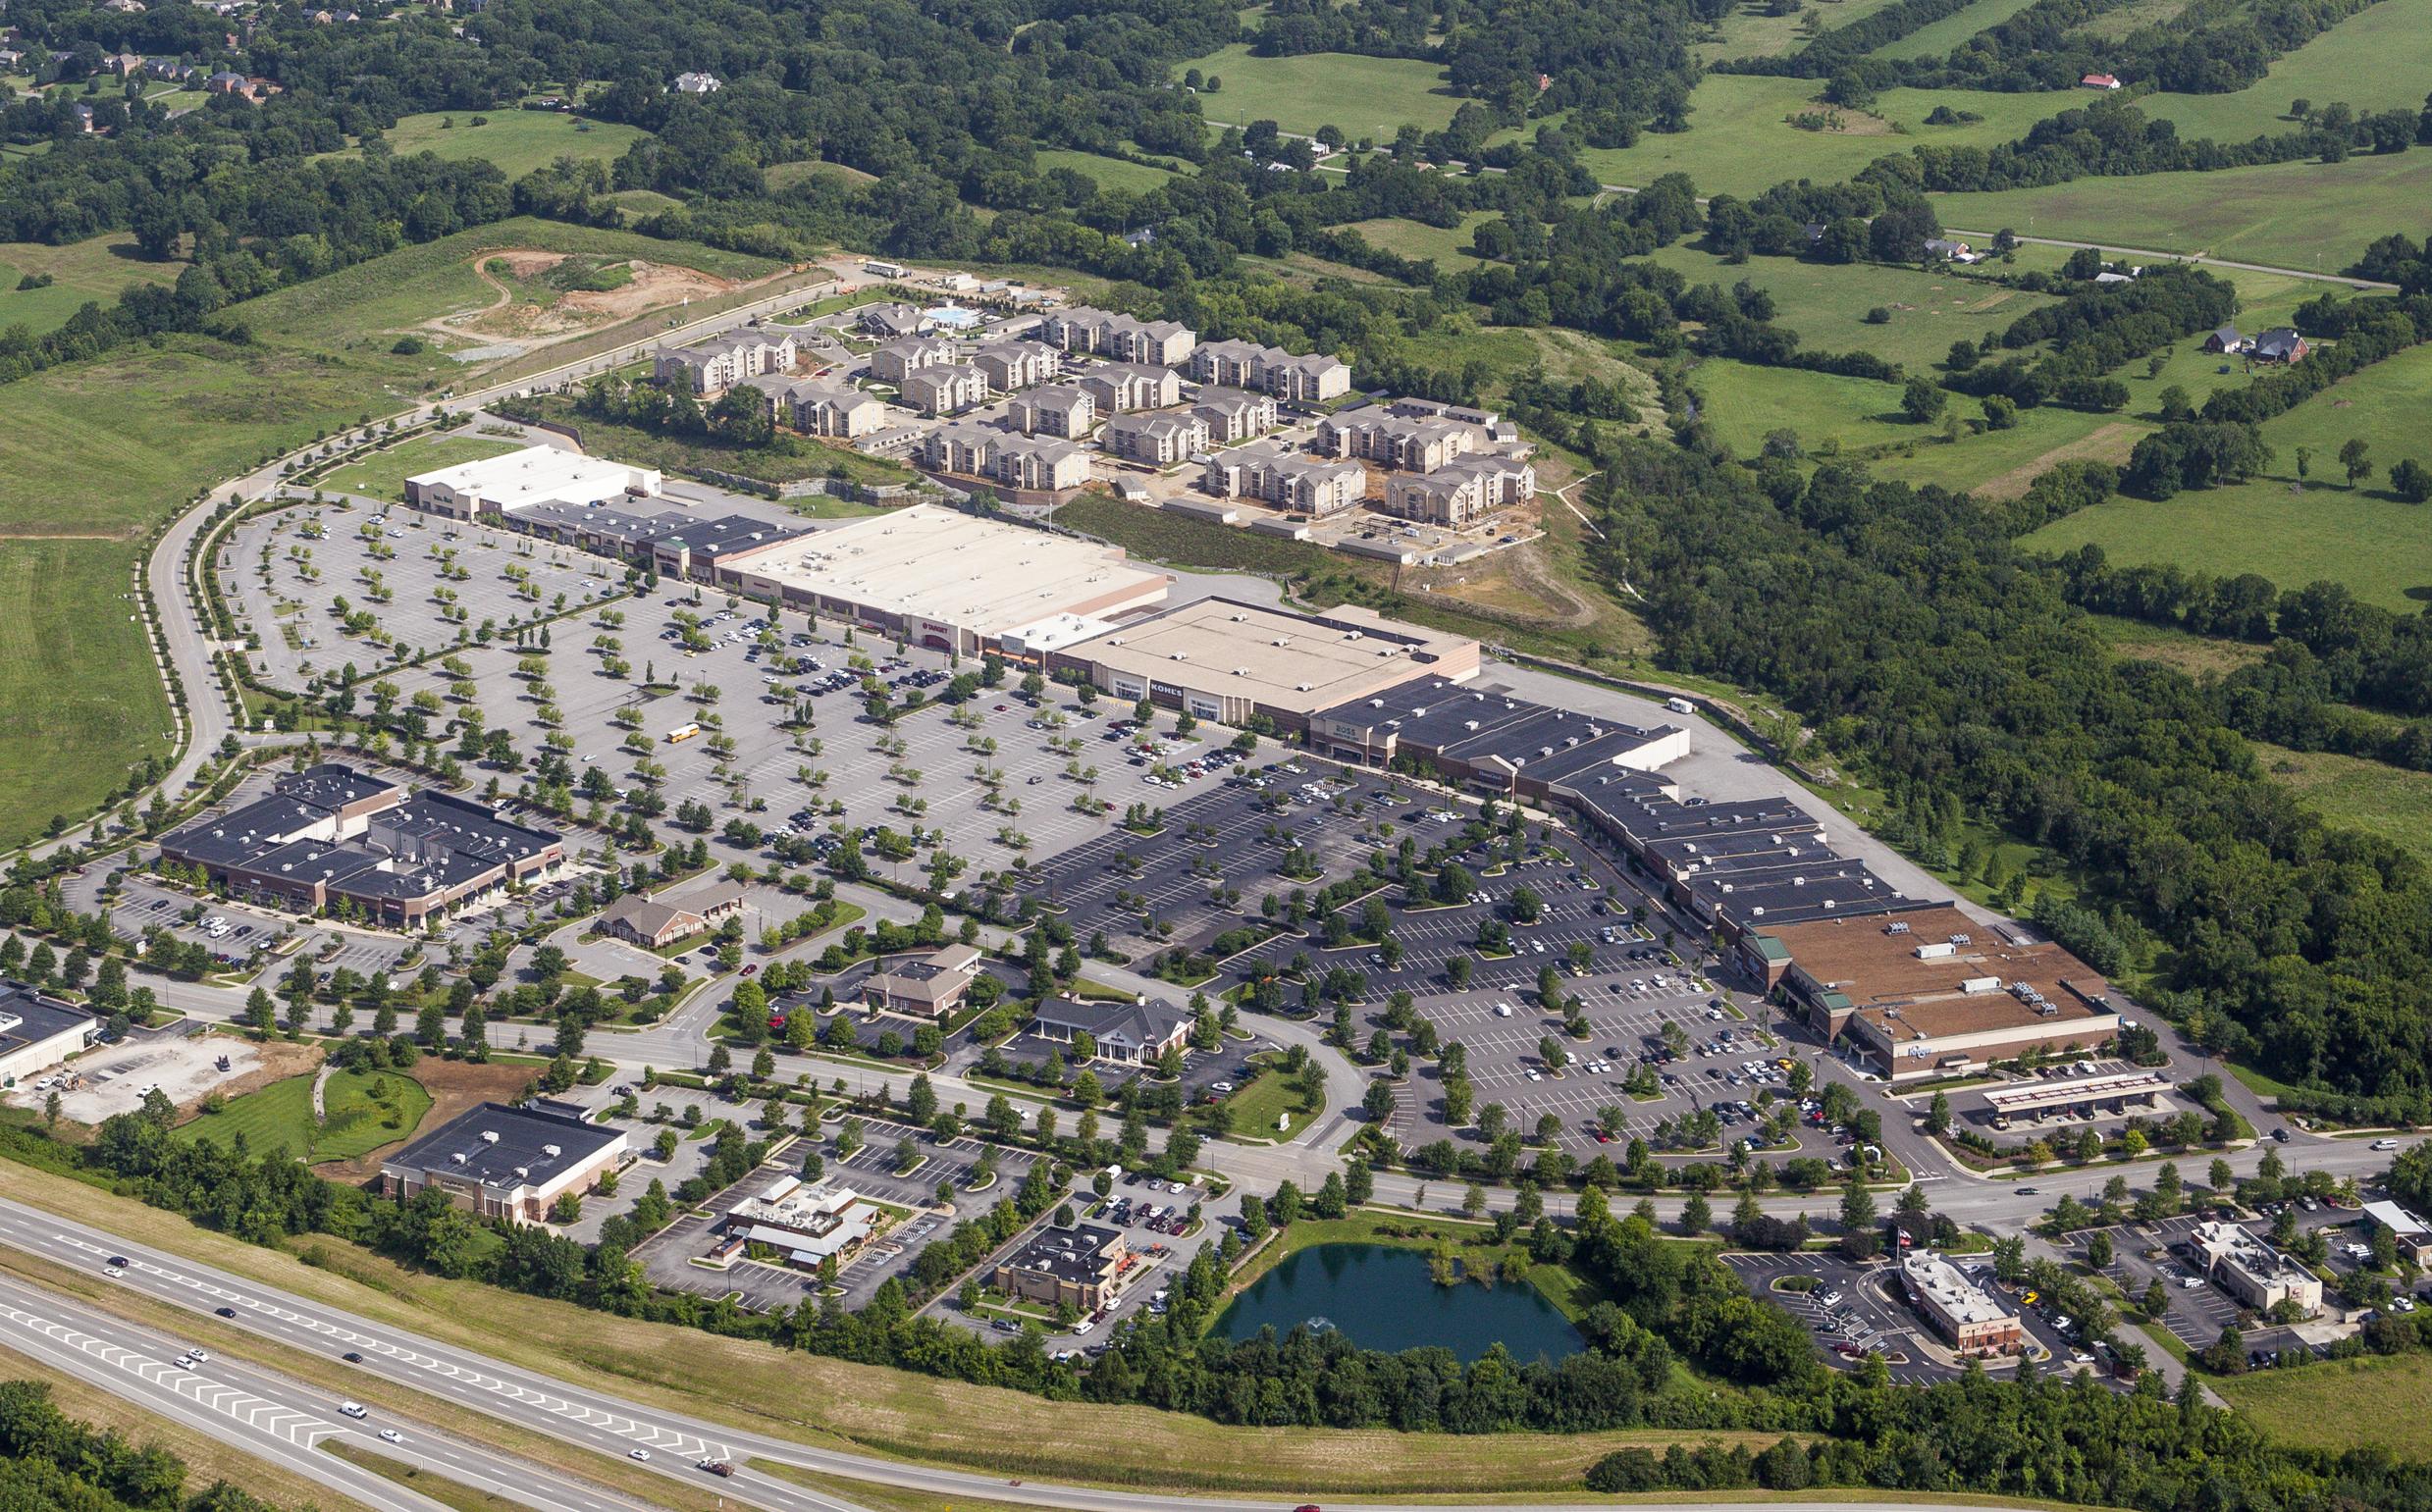 07.09.15-Glenbrook-Shopping-Center-Aerials-cropped-1.jpg